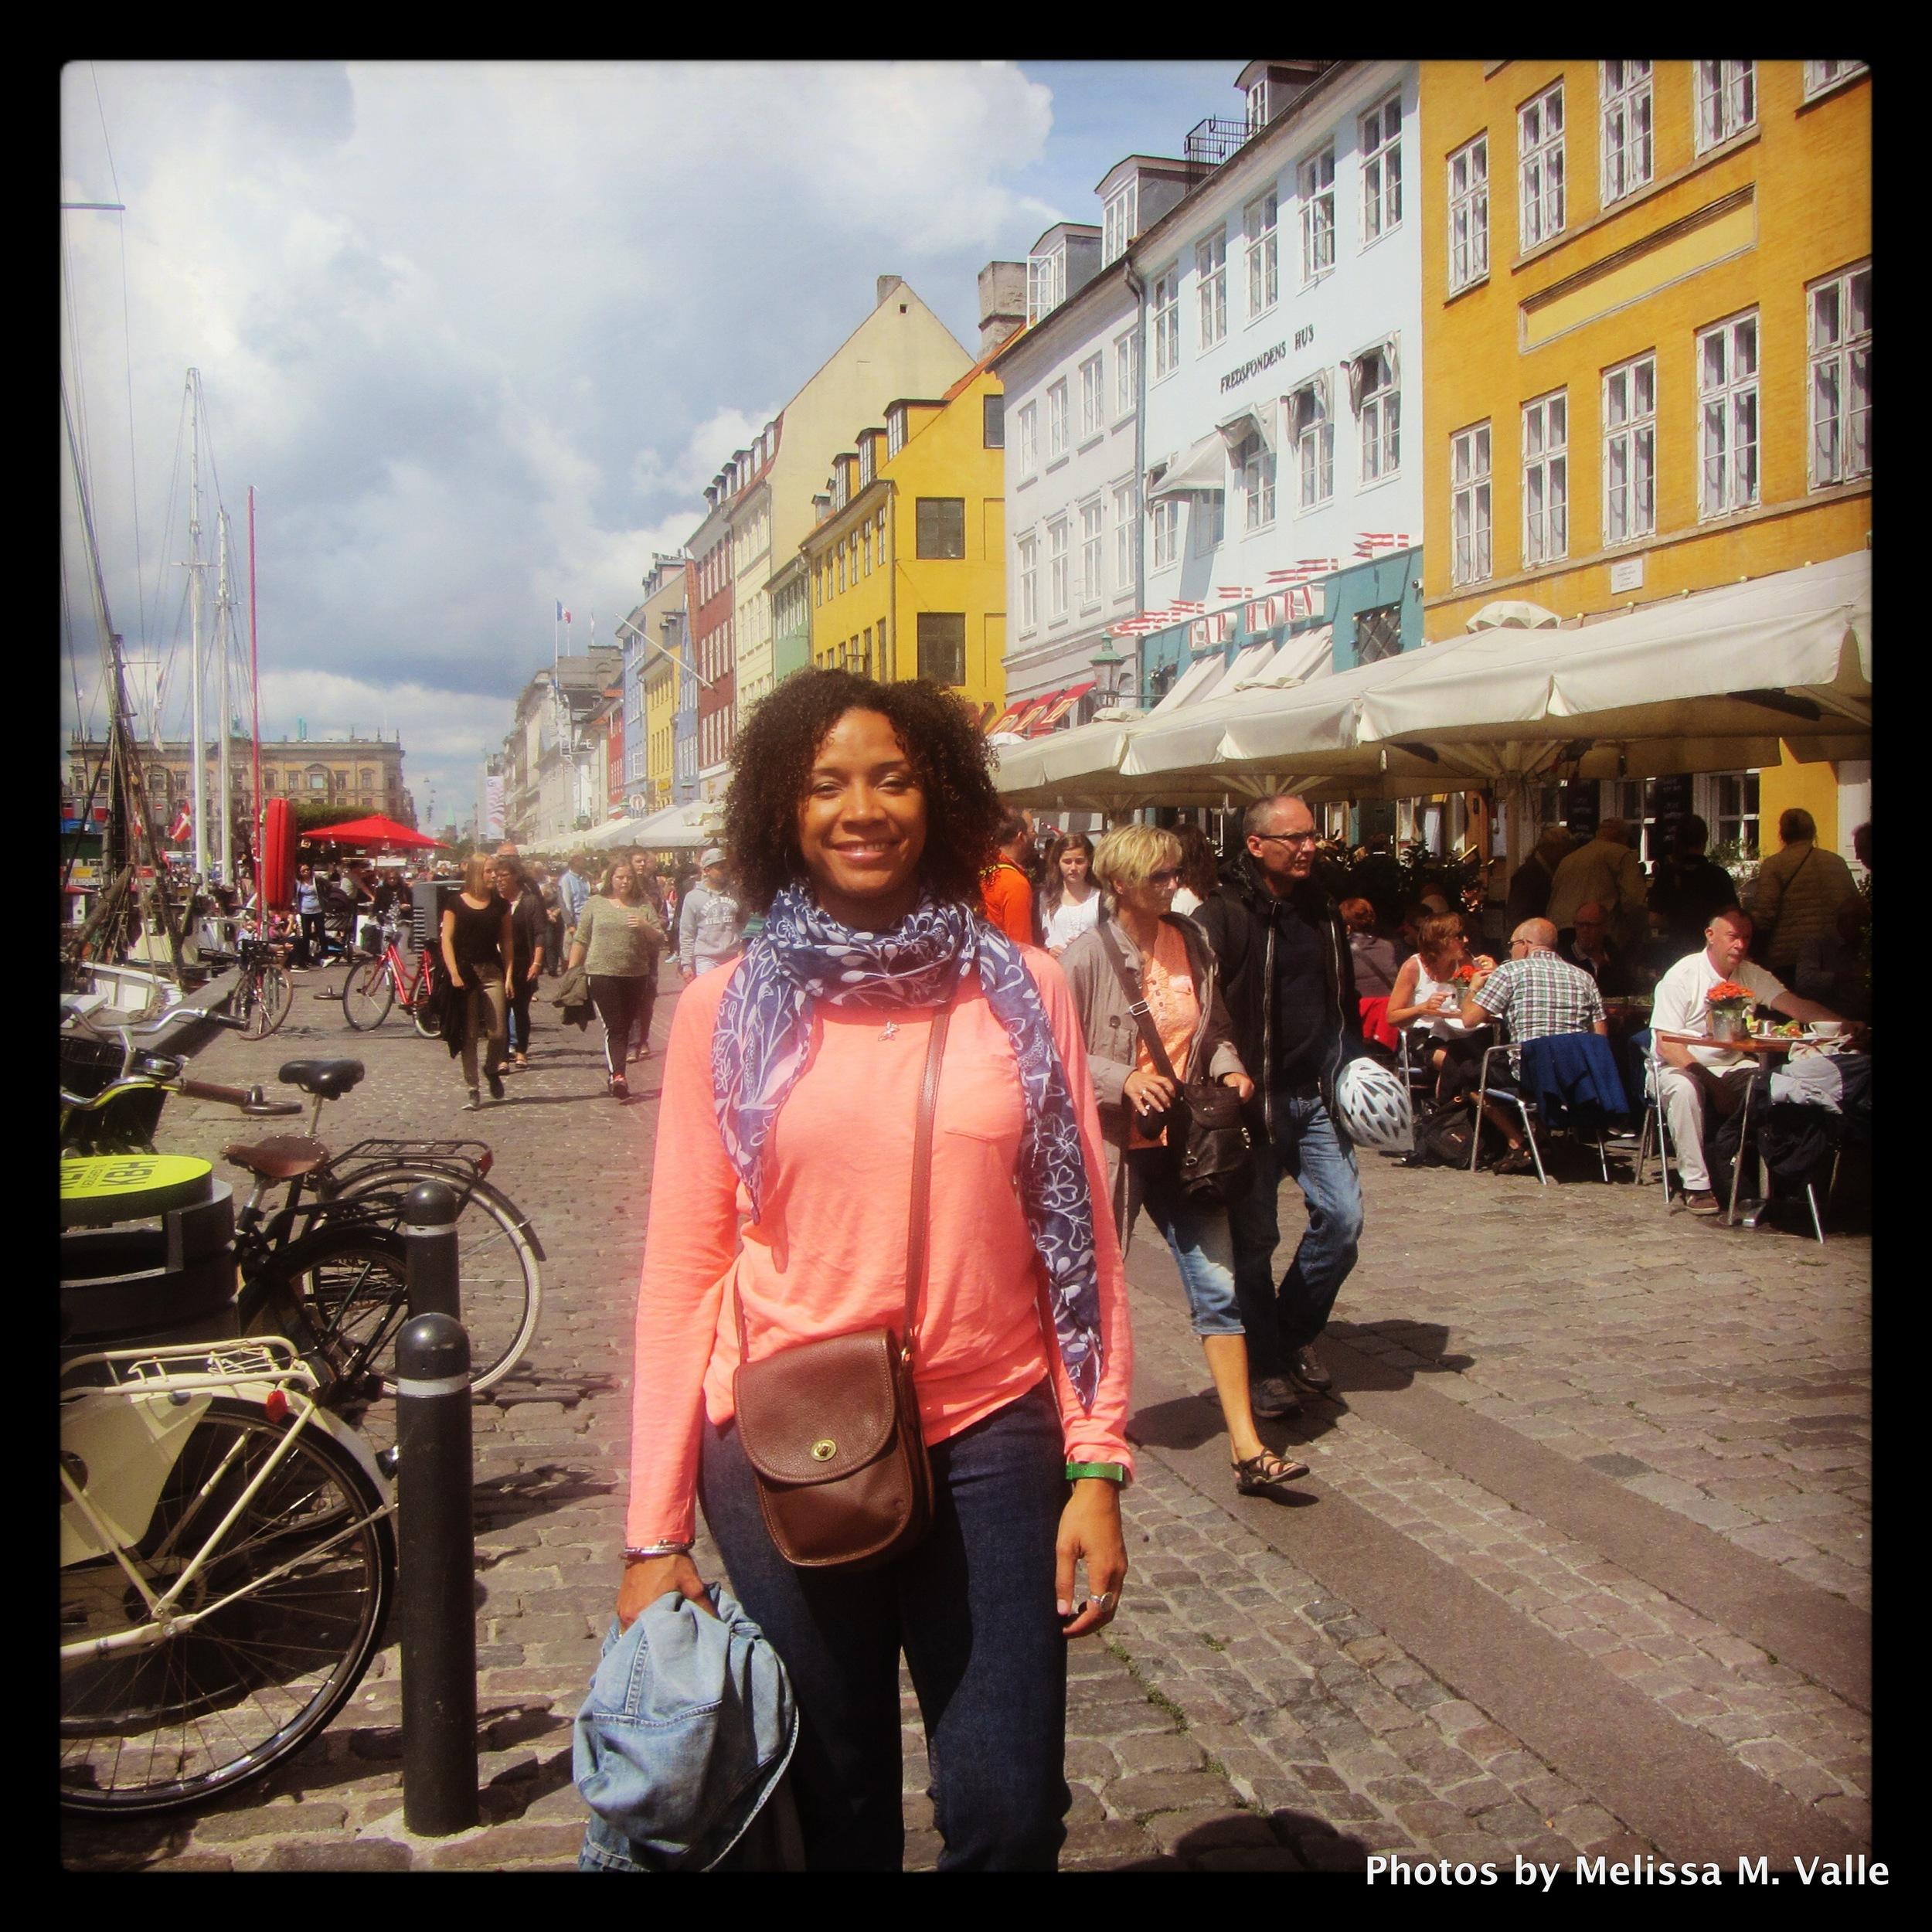 Me in Copenhagen, Denmark